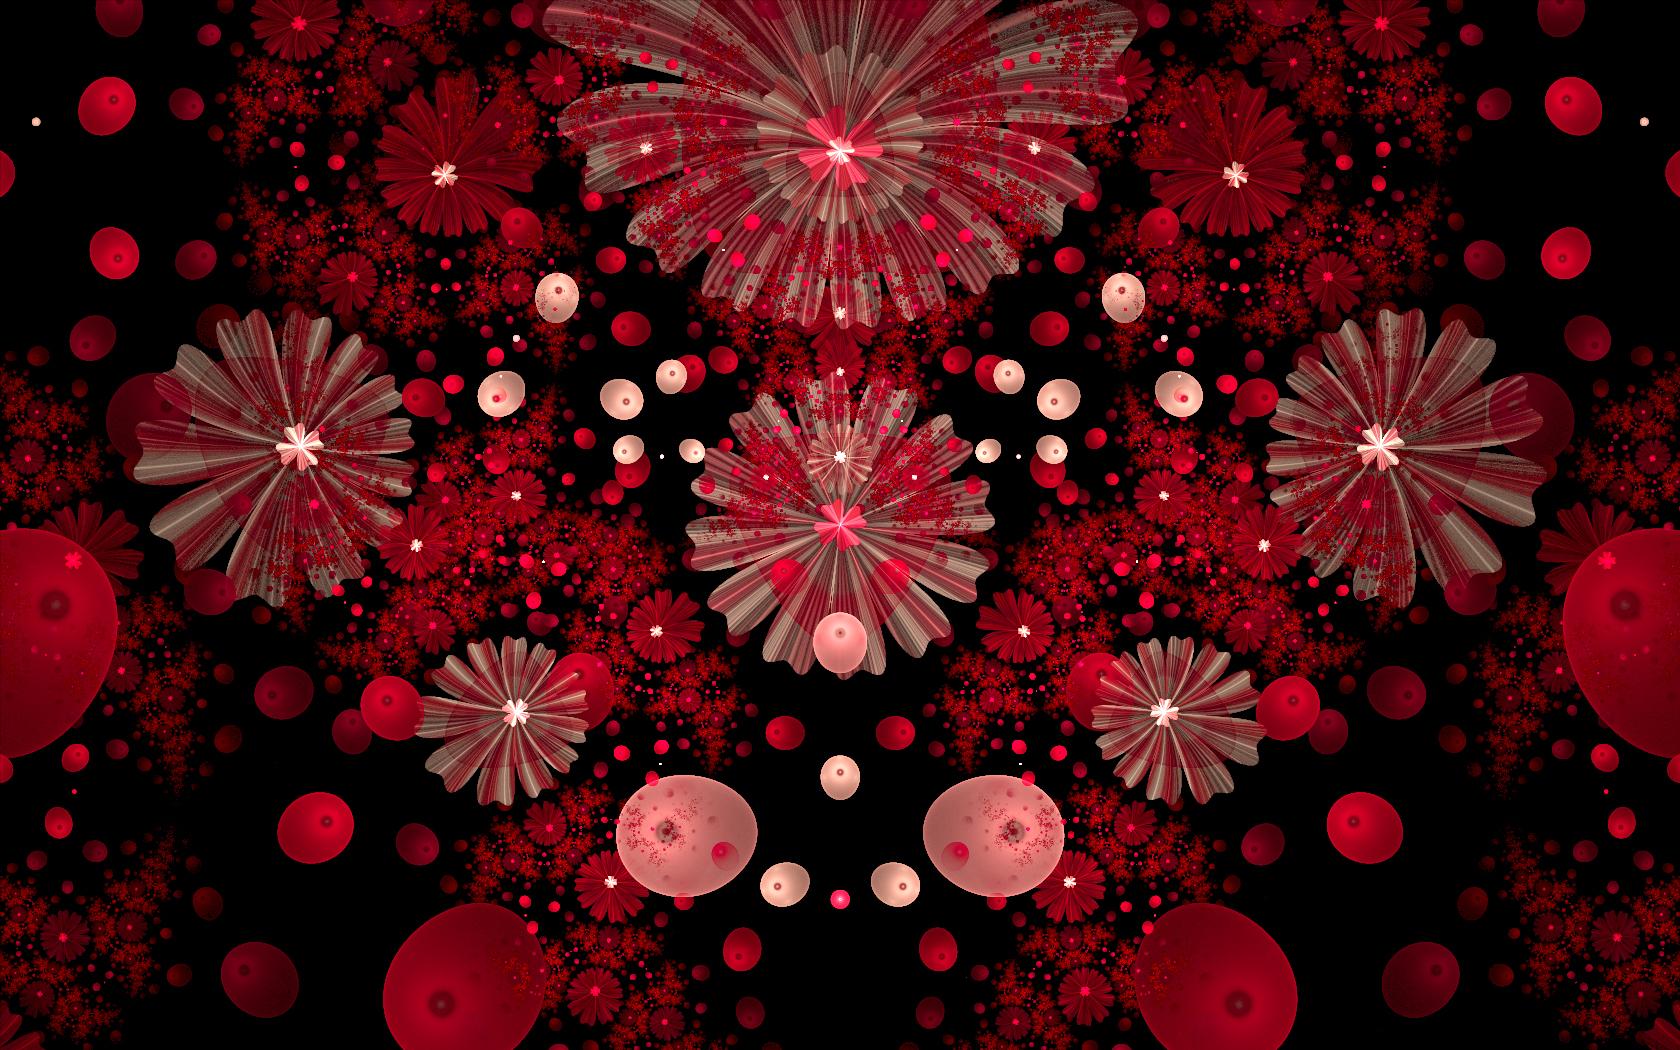 Fireworks by Anyzamarah